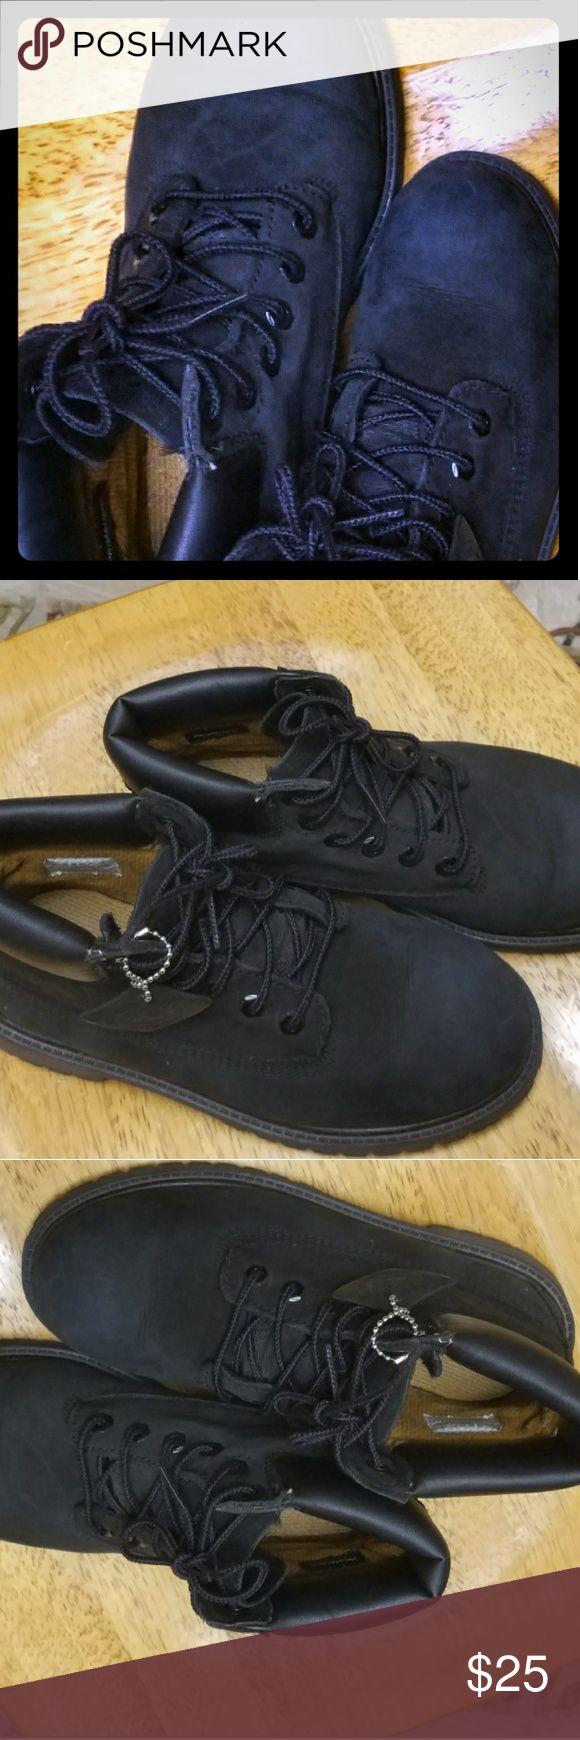 I just added this listing on Poshmark: Boys Timberland Black Boots NWT Size 2 $25.00. #shopmycloset #poshmark #fashion #shopping #style #forsale #Timberland #Other